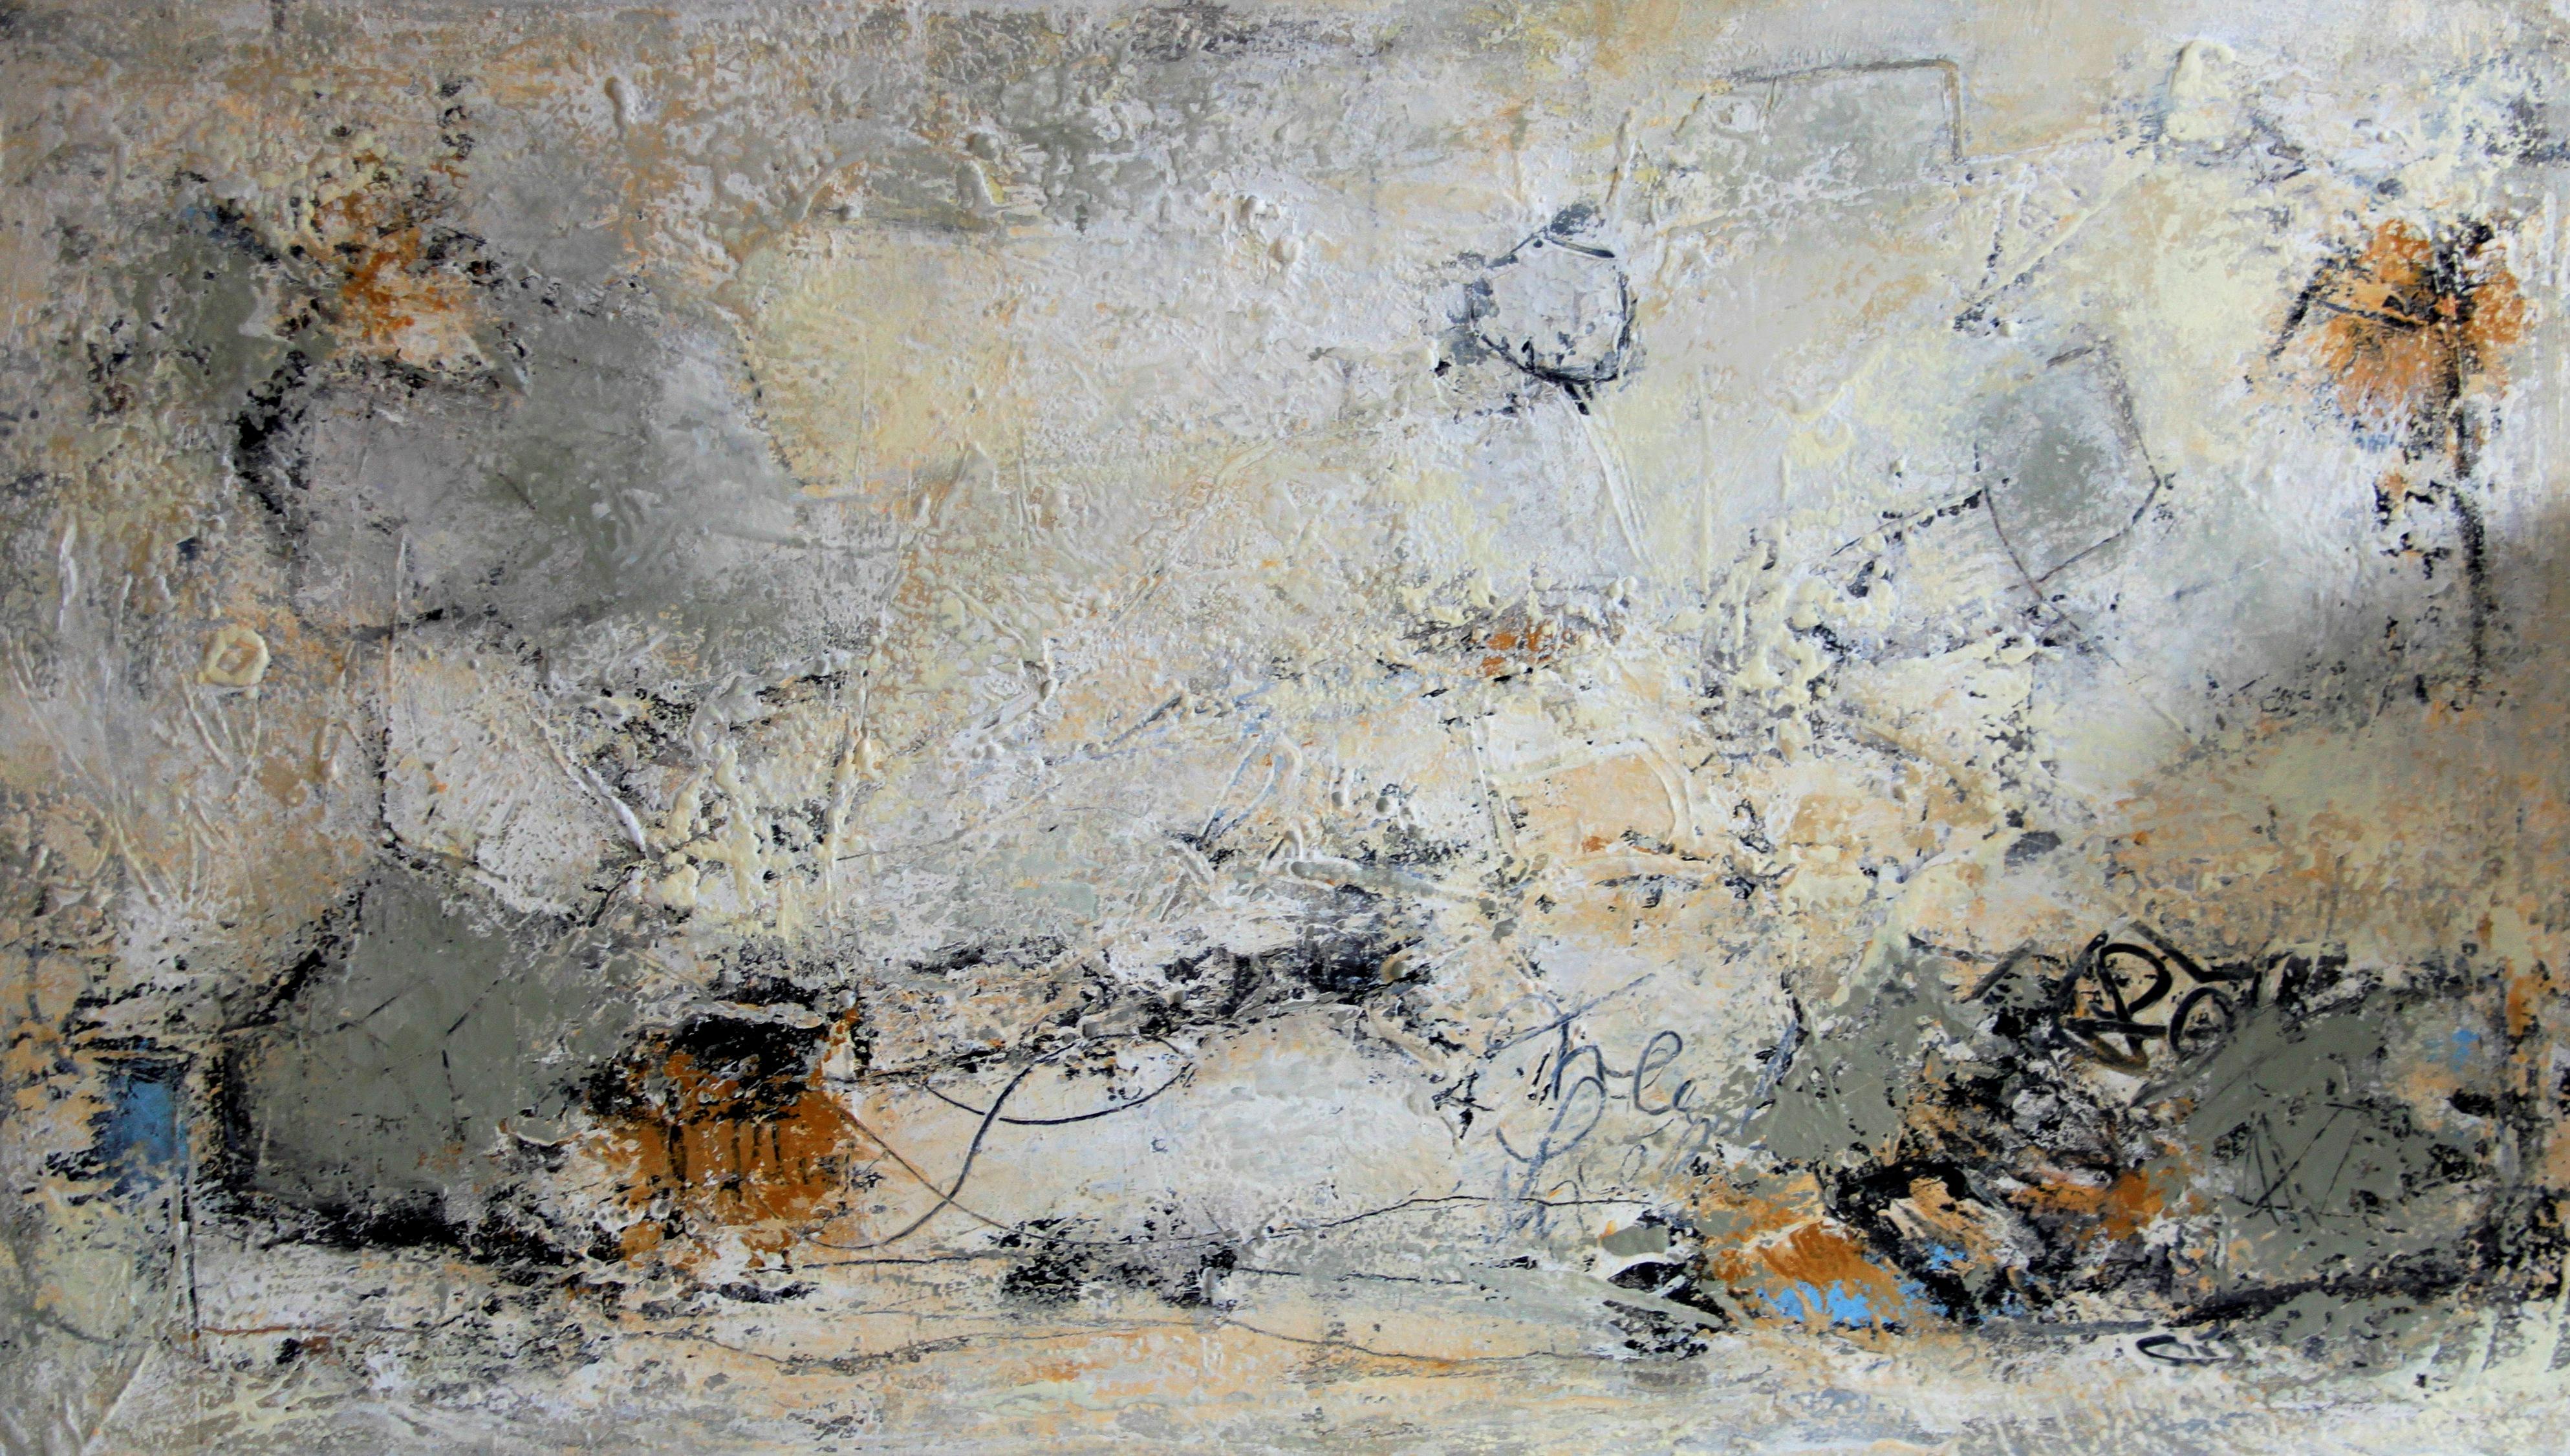 petra-lorch-komposition-10-070-140x80